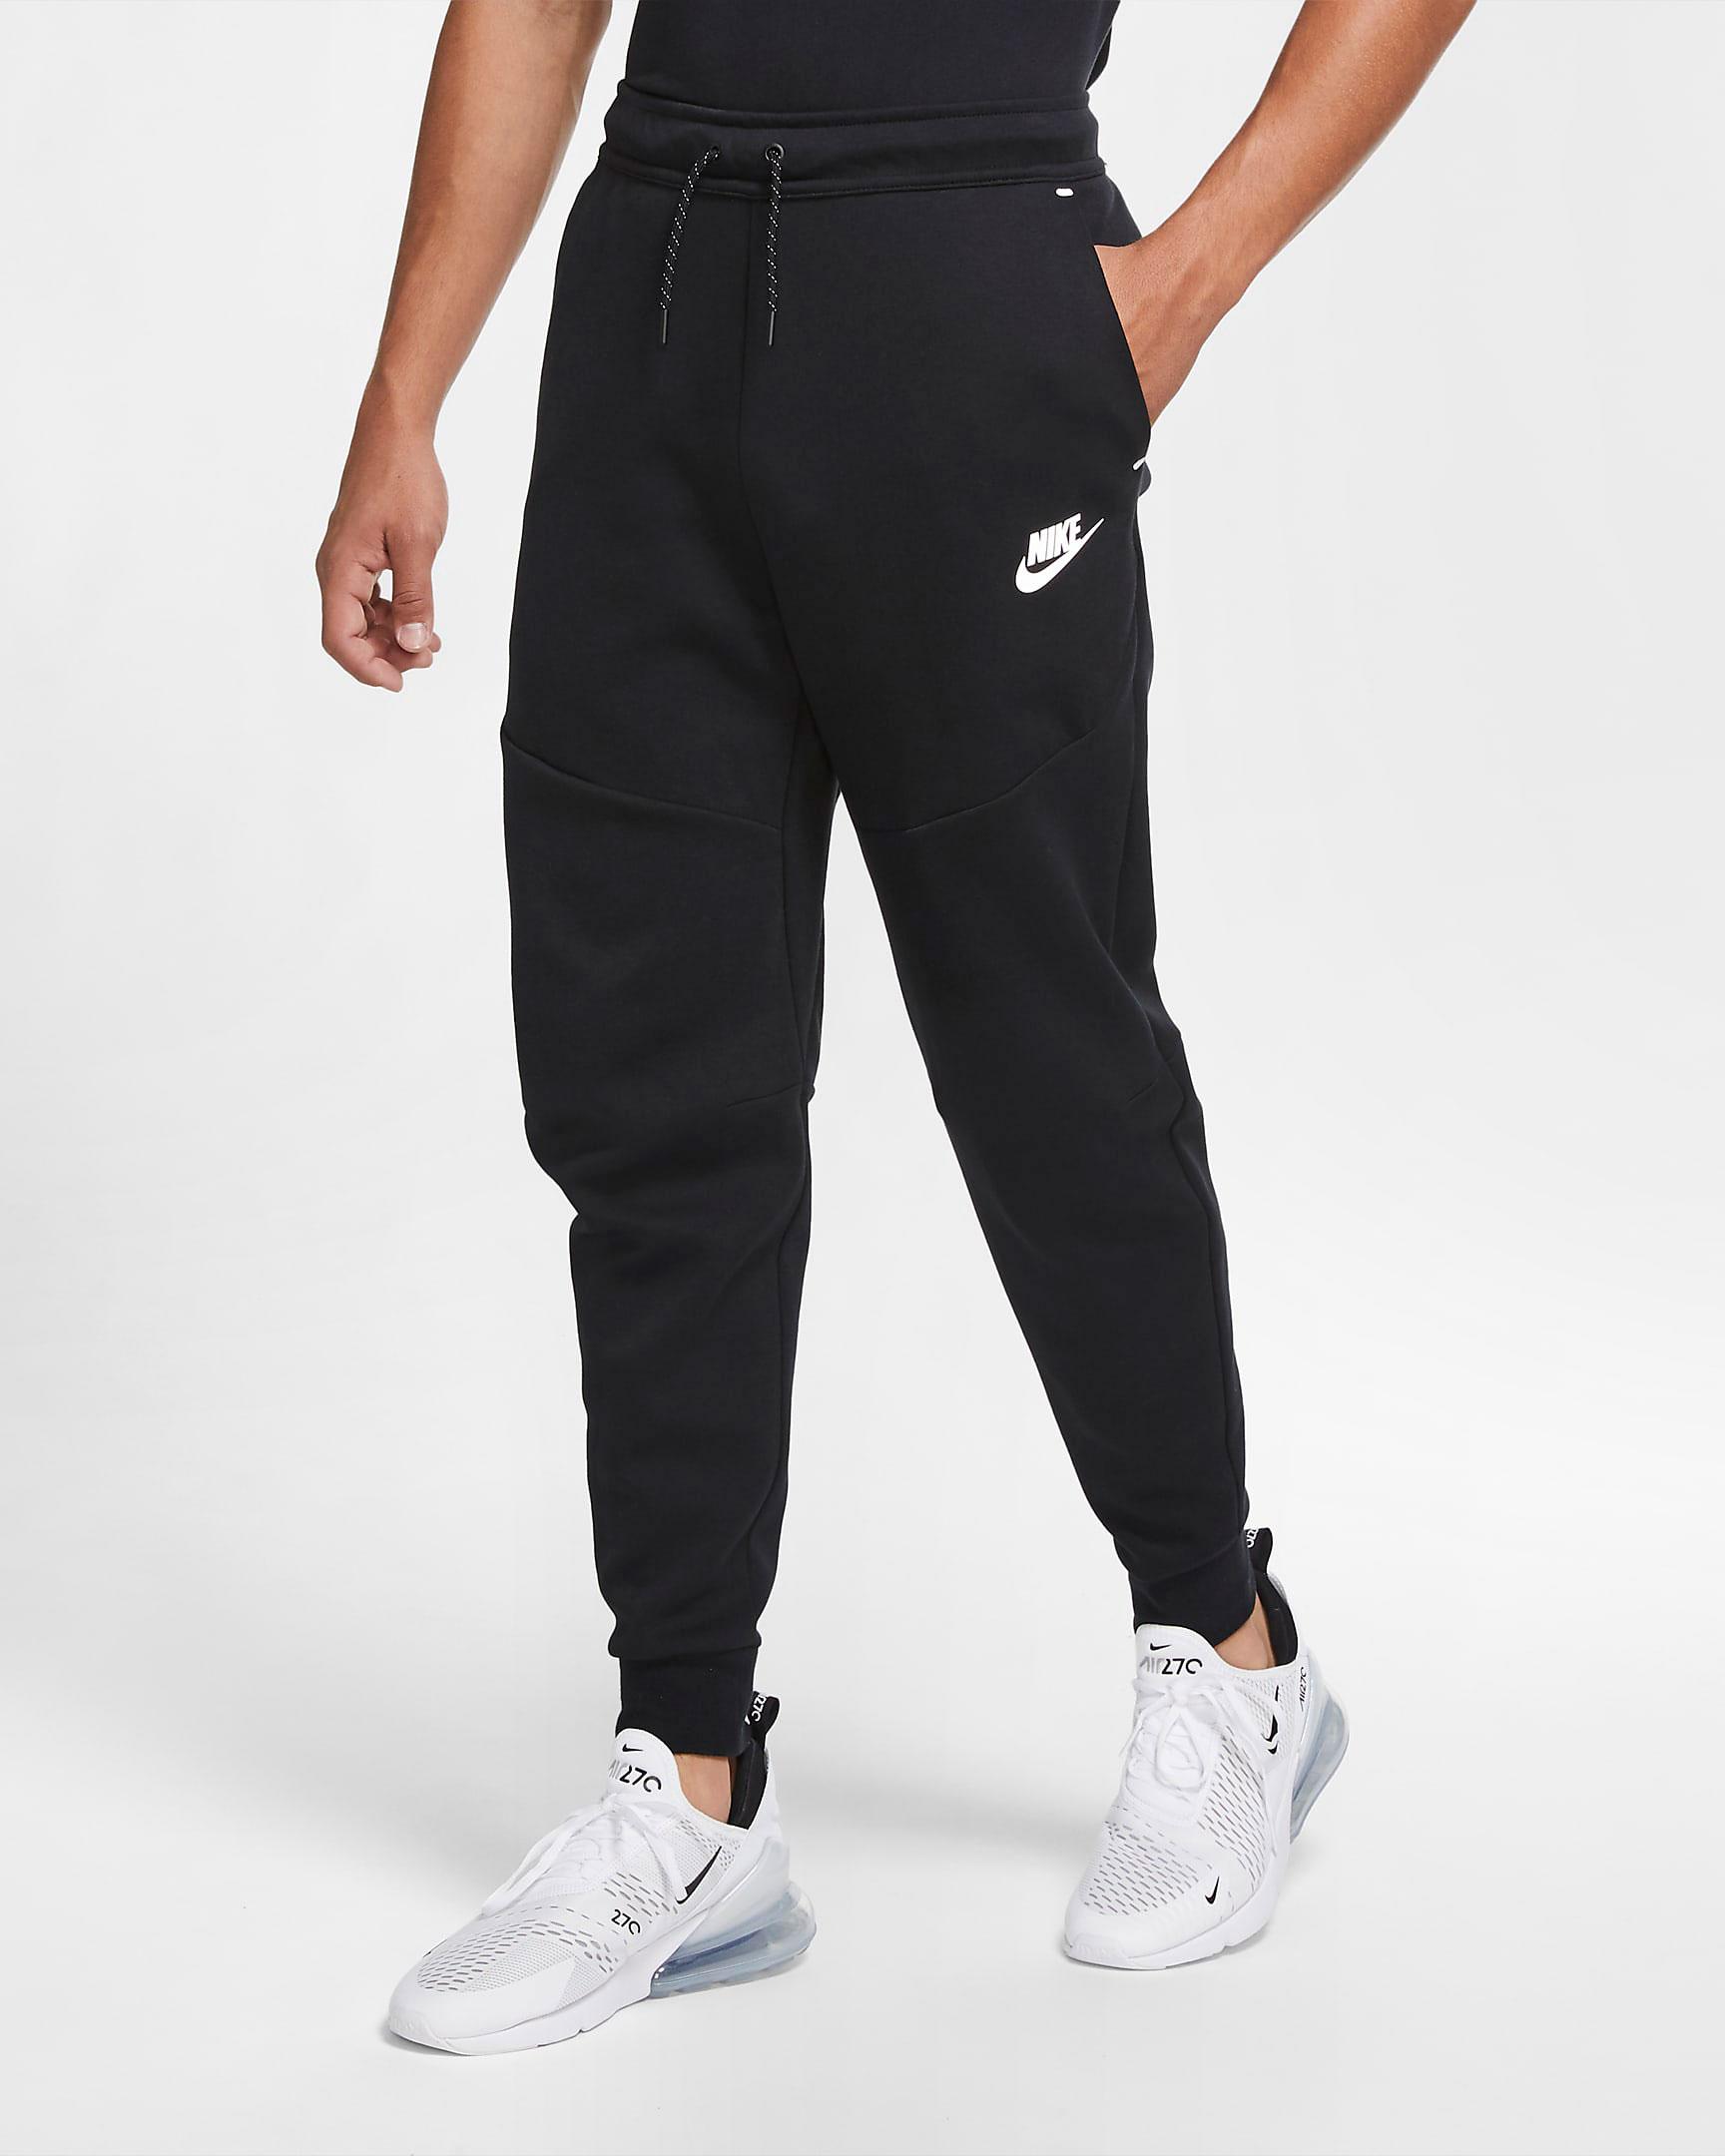 nike-kobe-5-protro-bruce-lee-matching-jogger-pants-1